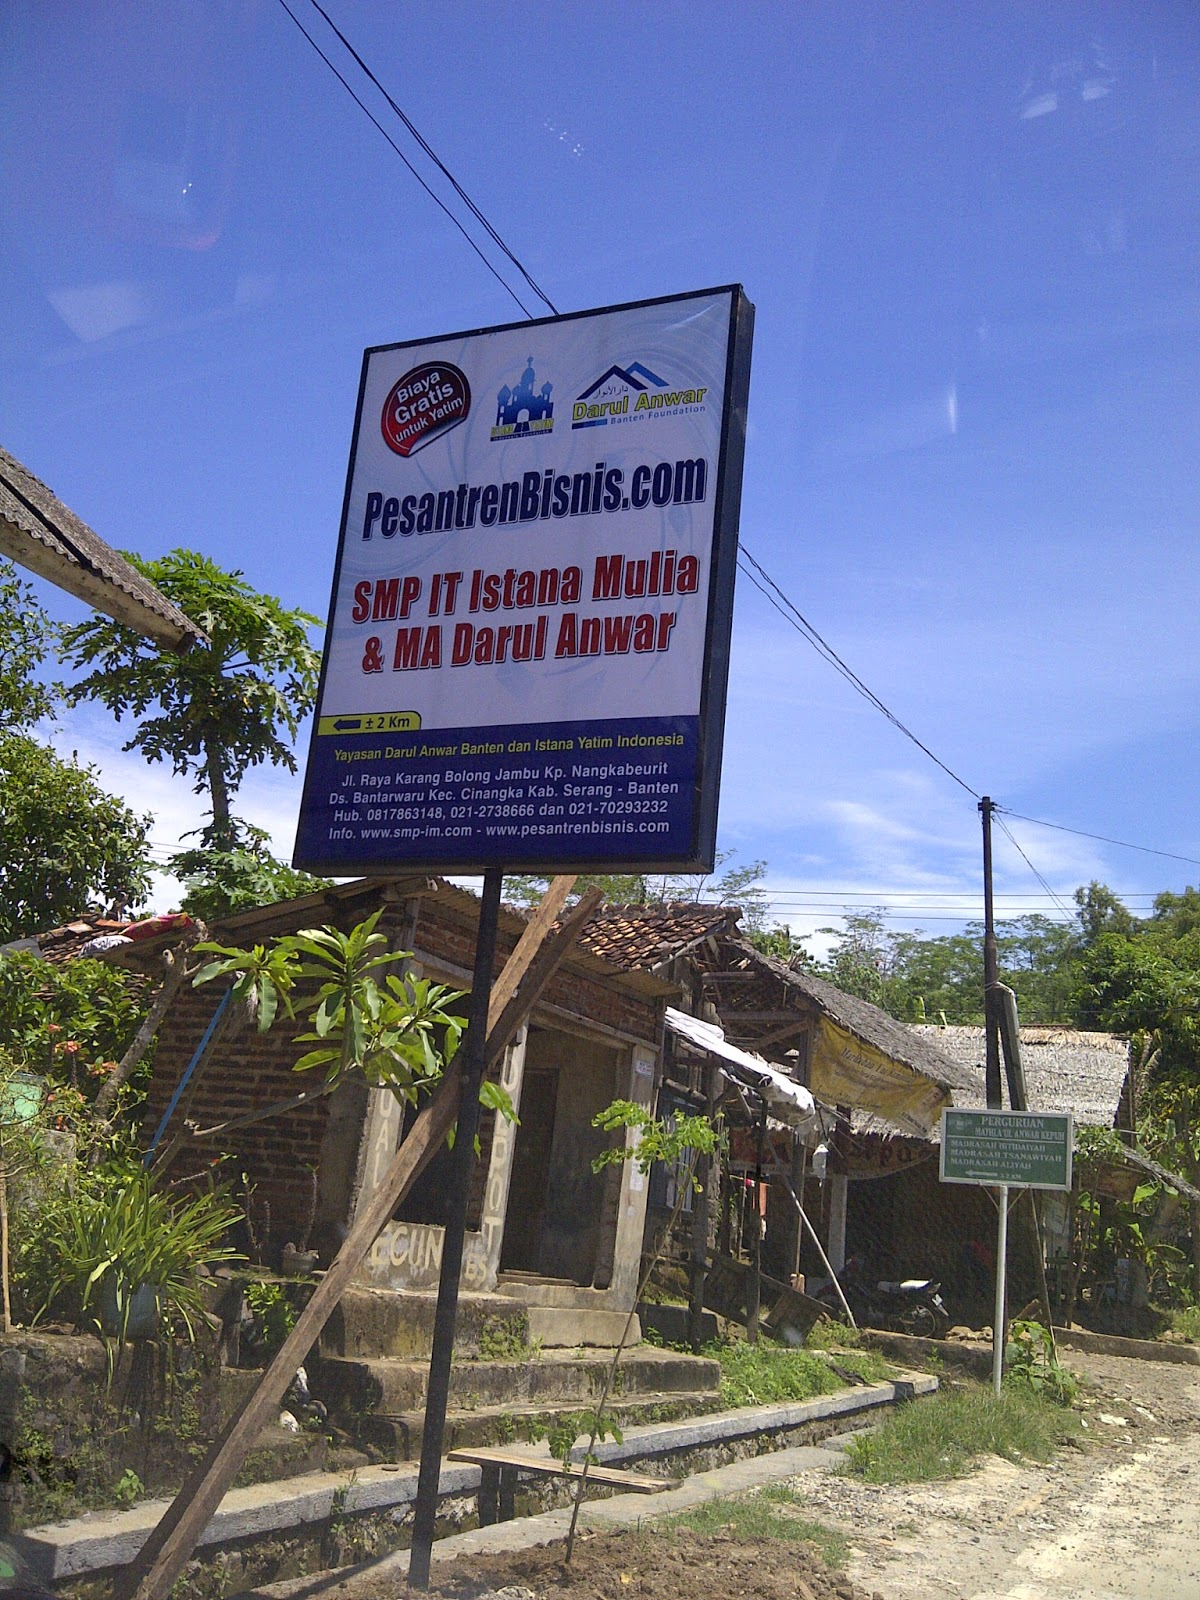 Smp Boarding Unggulan Nasional Pesantren Entrepreneurs Plang Petunjuk Arah Istana